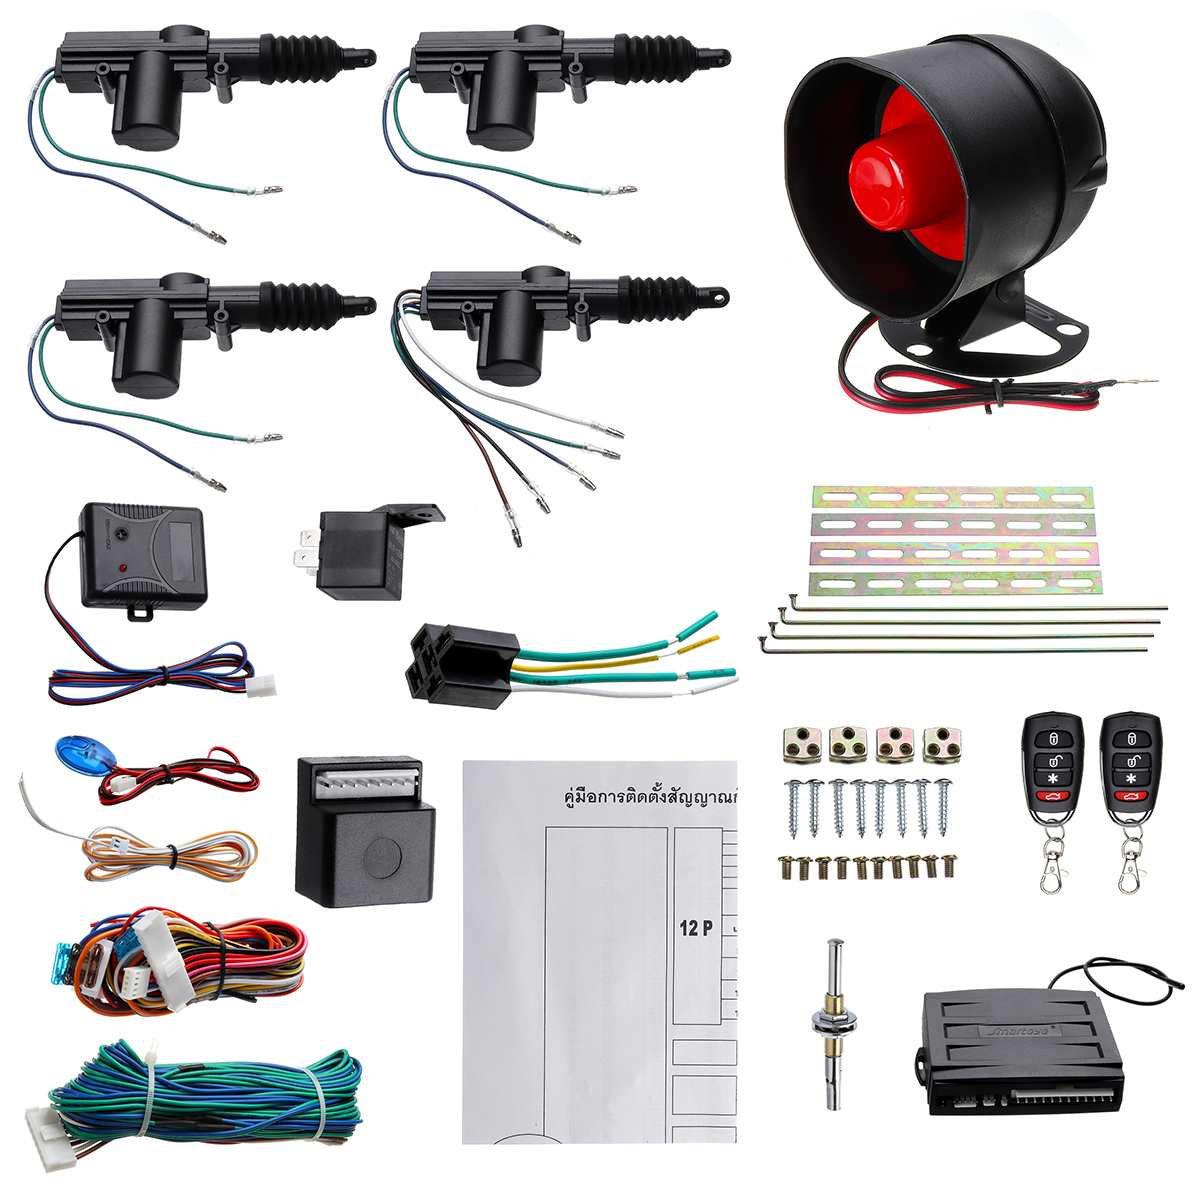 Remote Control Central Locking Remote Keyless Entry Security Car Alarm 4 Door Power Lock Burglar Alarm System Security